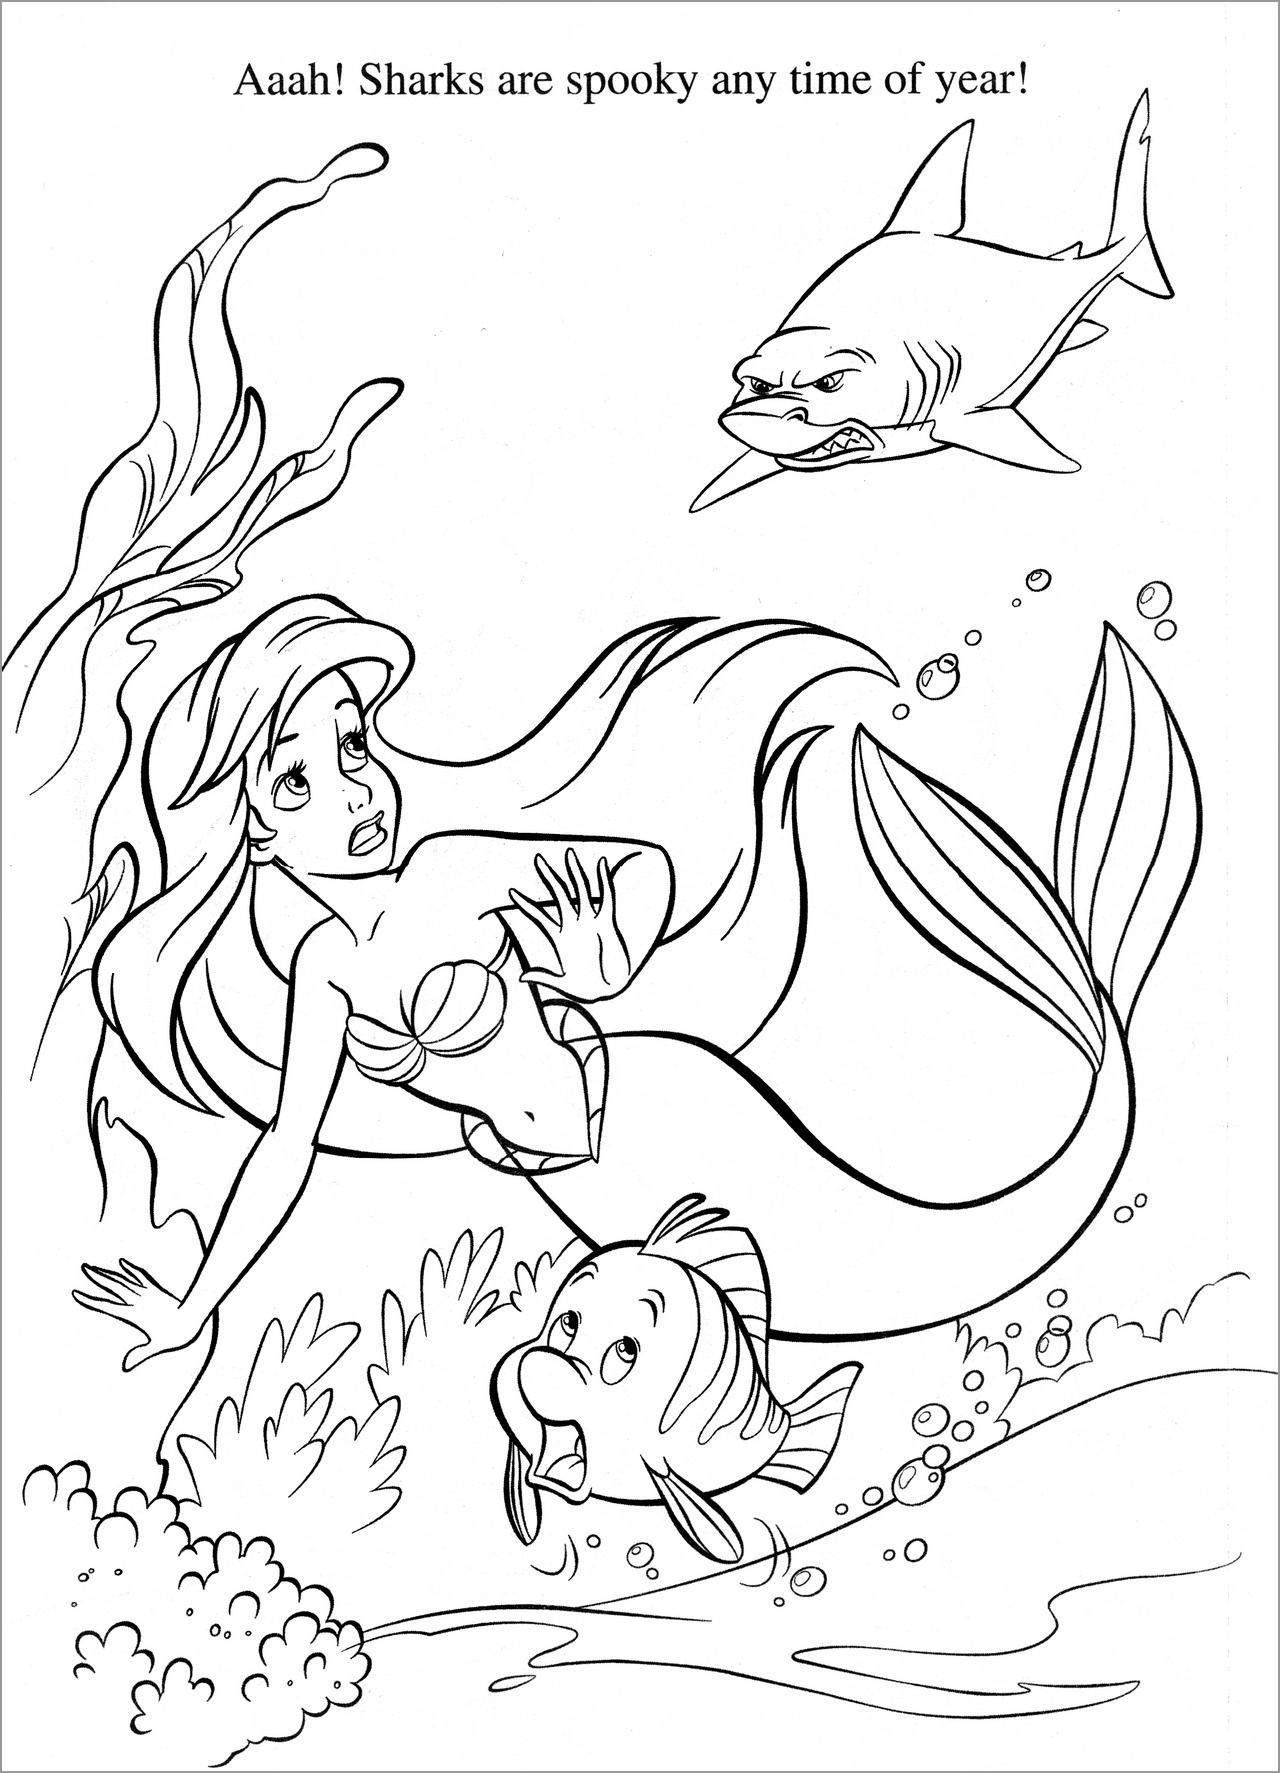 Mermaid and Shark Coloring Page